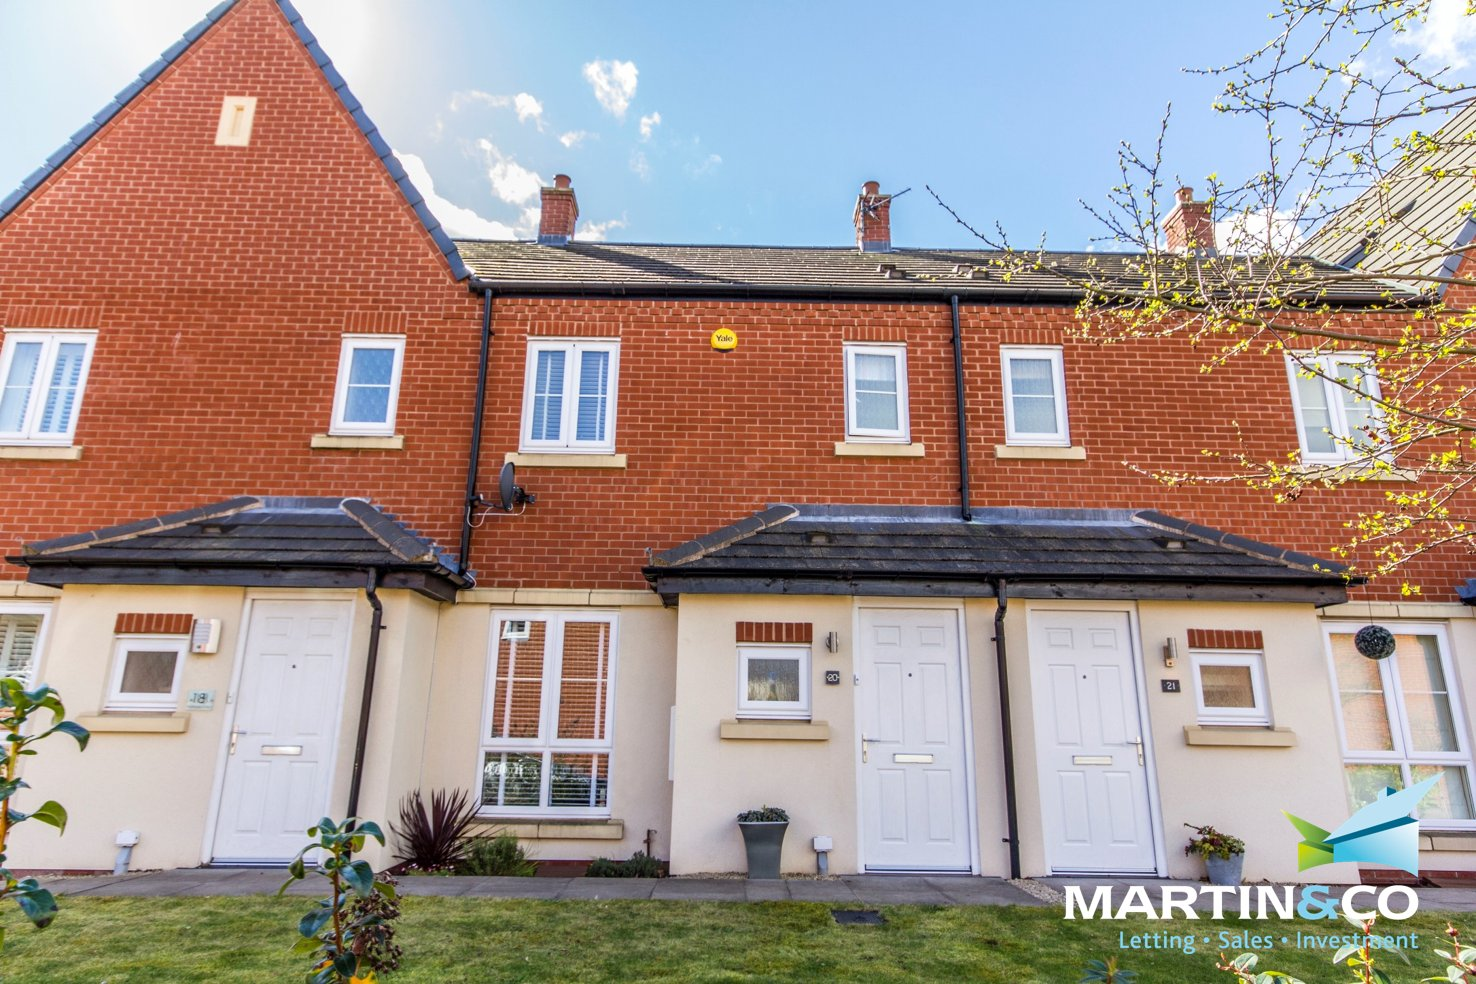 Property For Rent In Nightingale Close Edgbaston